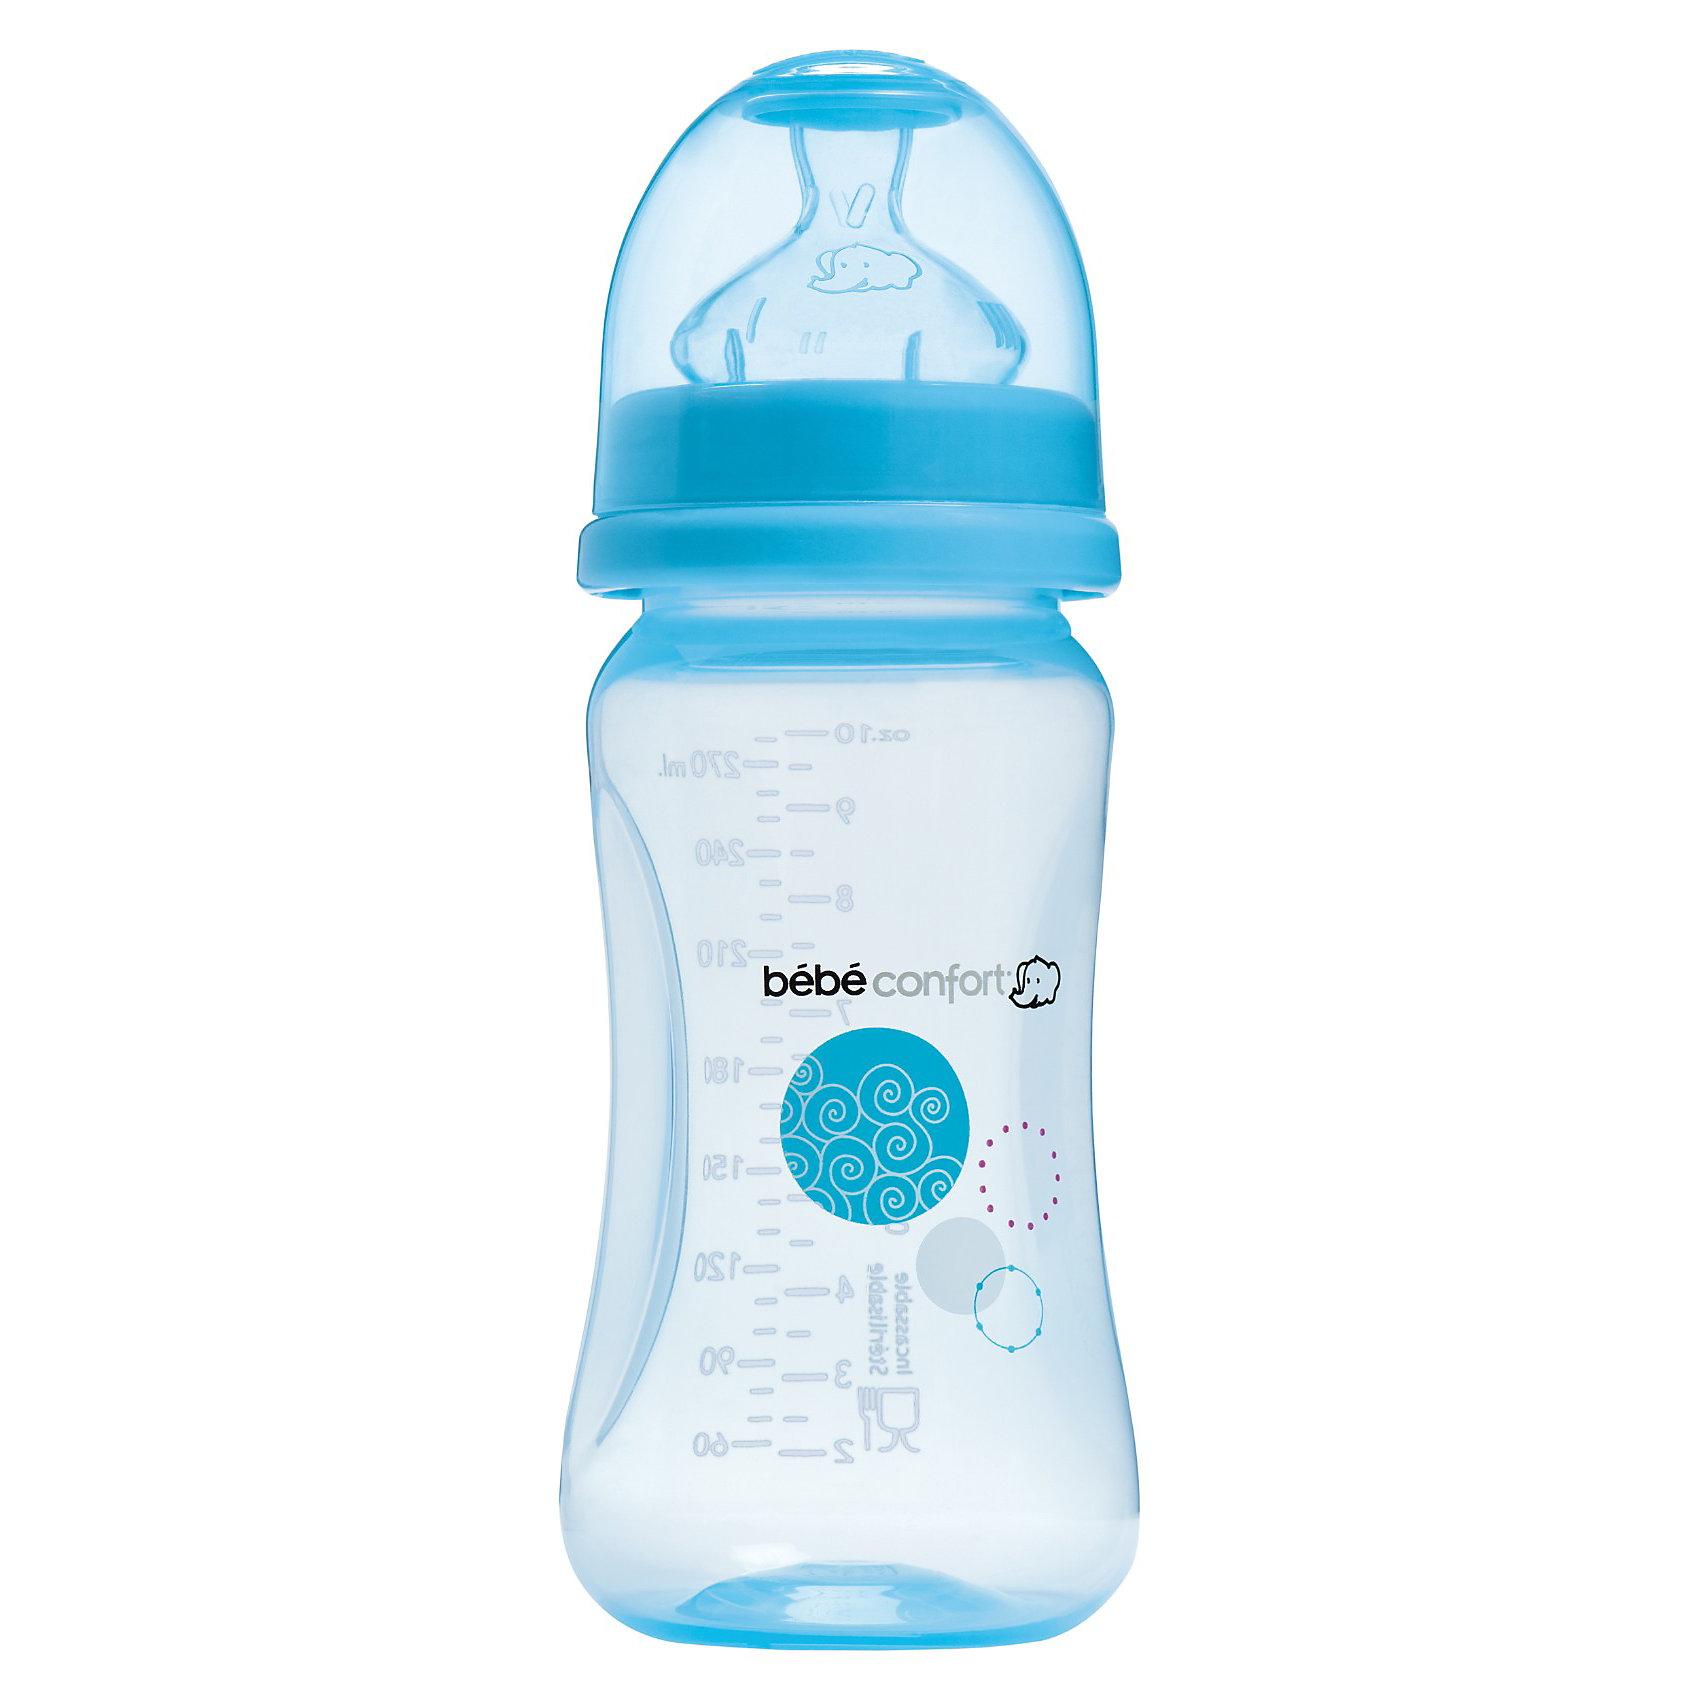 Бутылочка для кормления Maternity, 270 мл, голубаяТовары для кормления<br>Бутылочка для кормления Maternity, 270 мл, голубая<br>